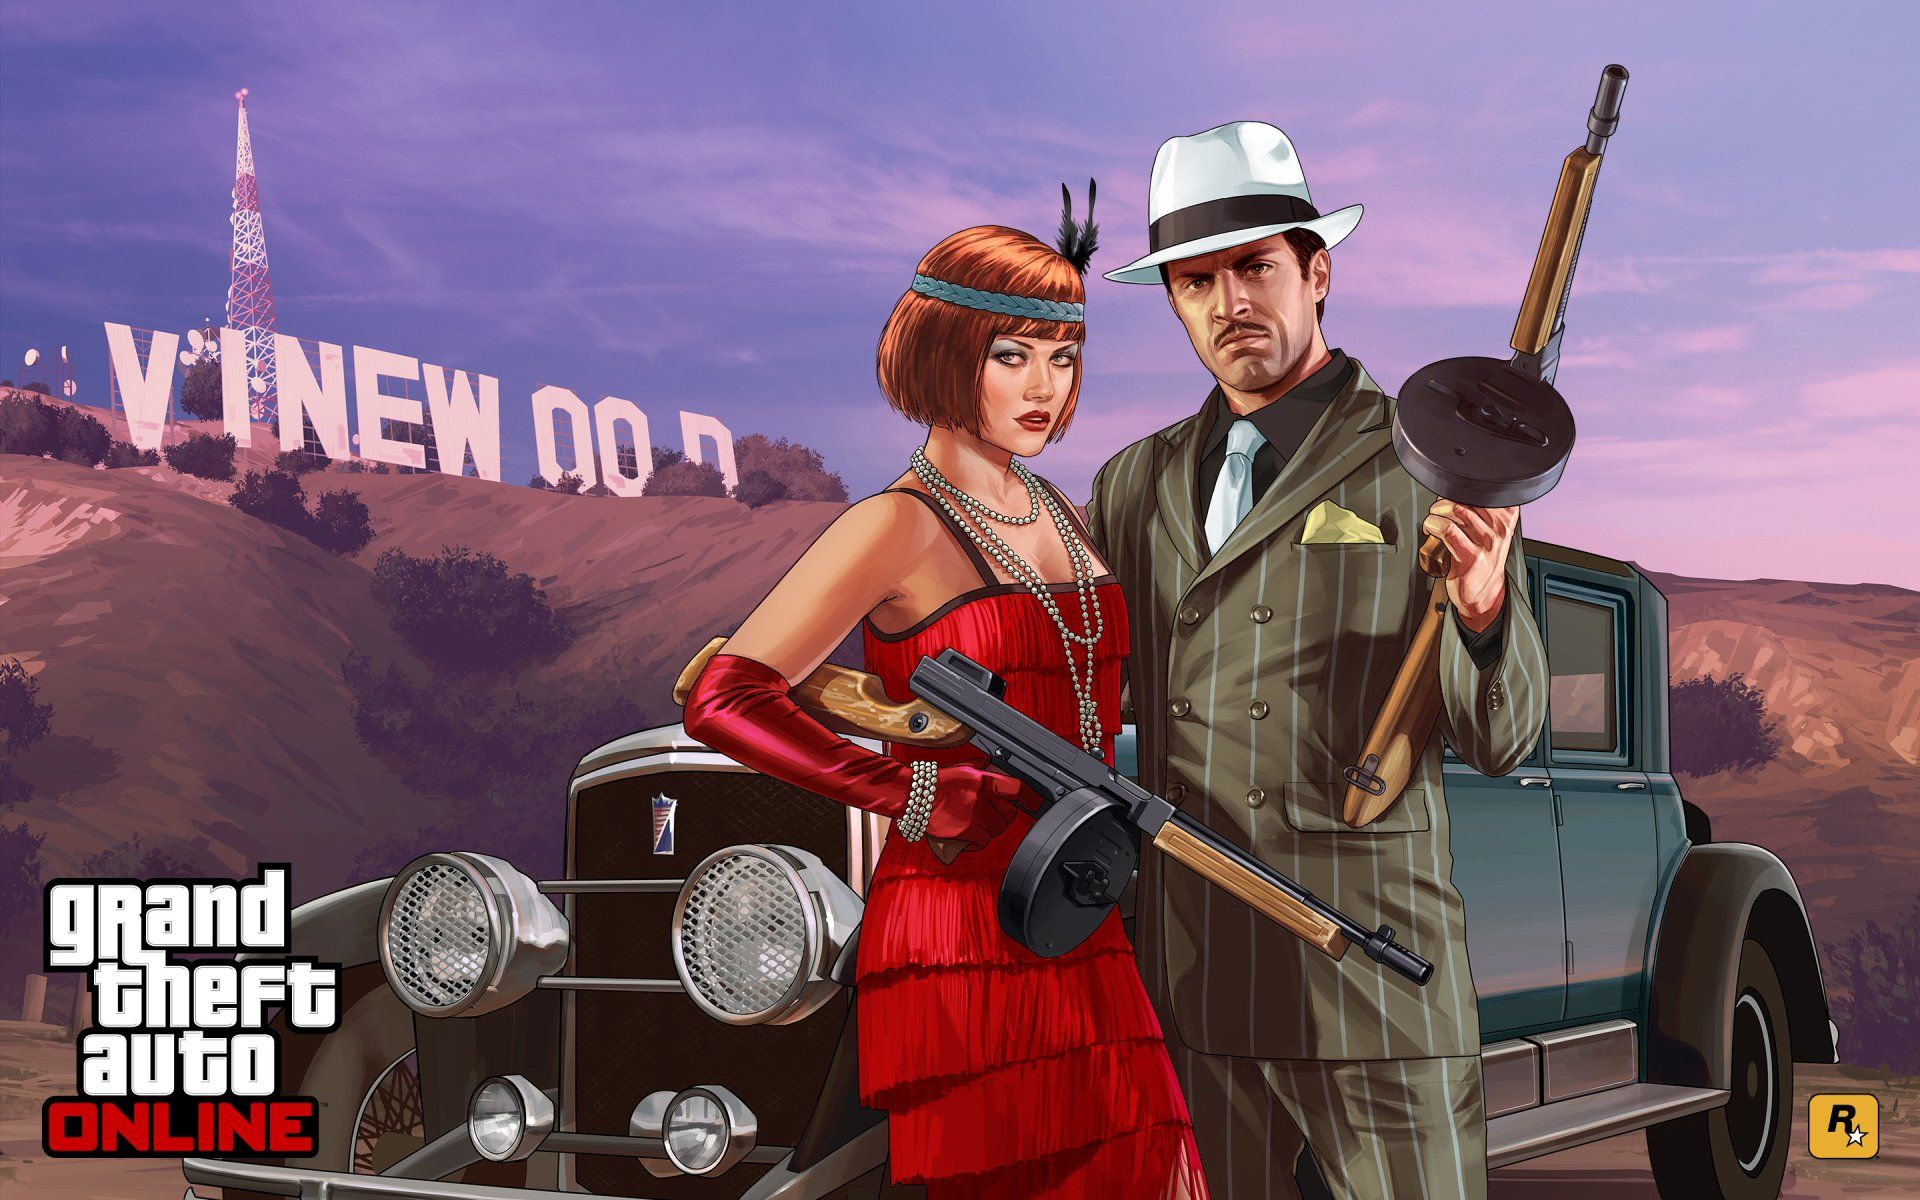 Video Game Grand Theft Auto V Gangsta Wallpaper Gta